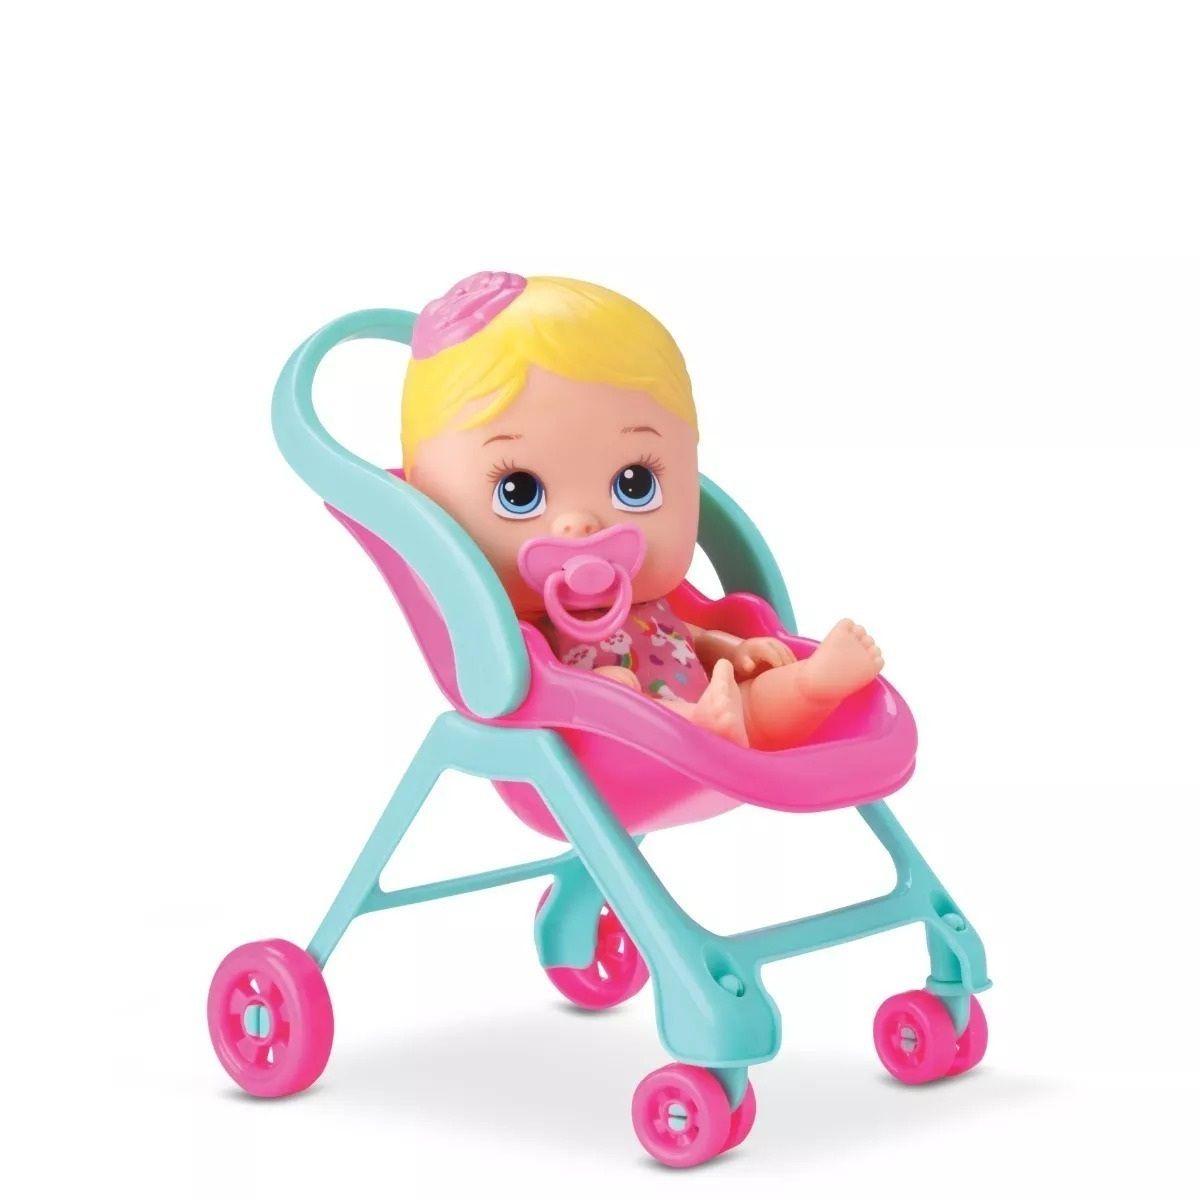 Boneca My Little Collection Tal Mãe Tal Filha - Diver Toys